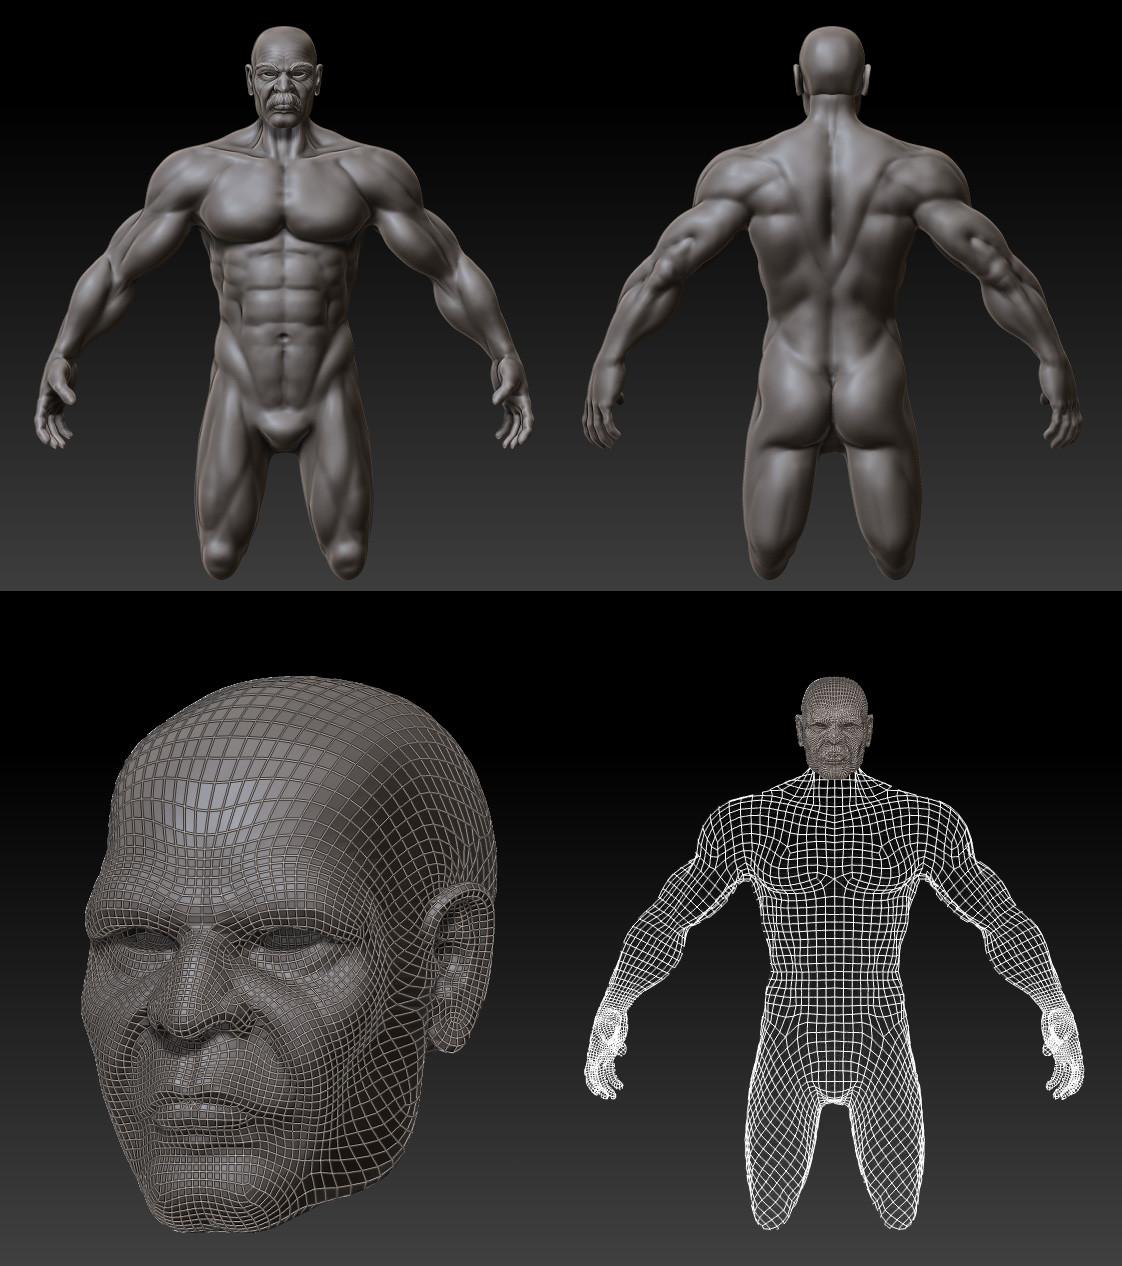 Marco ortolan base corpo